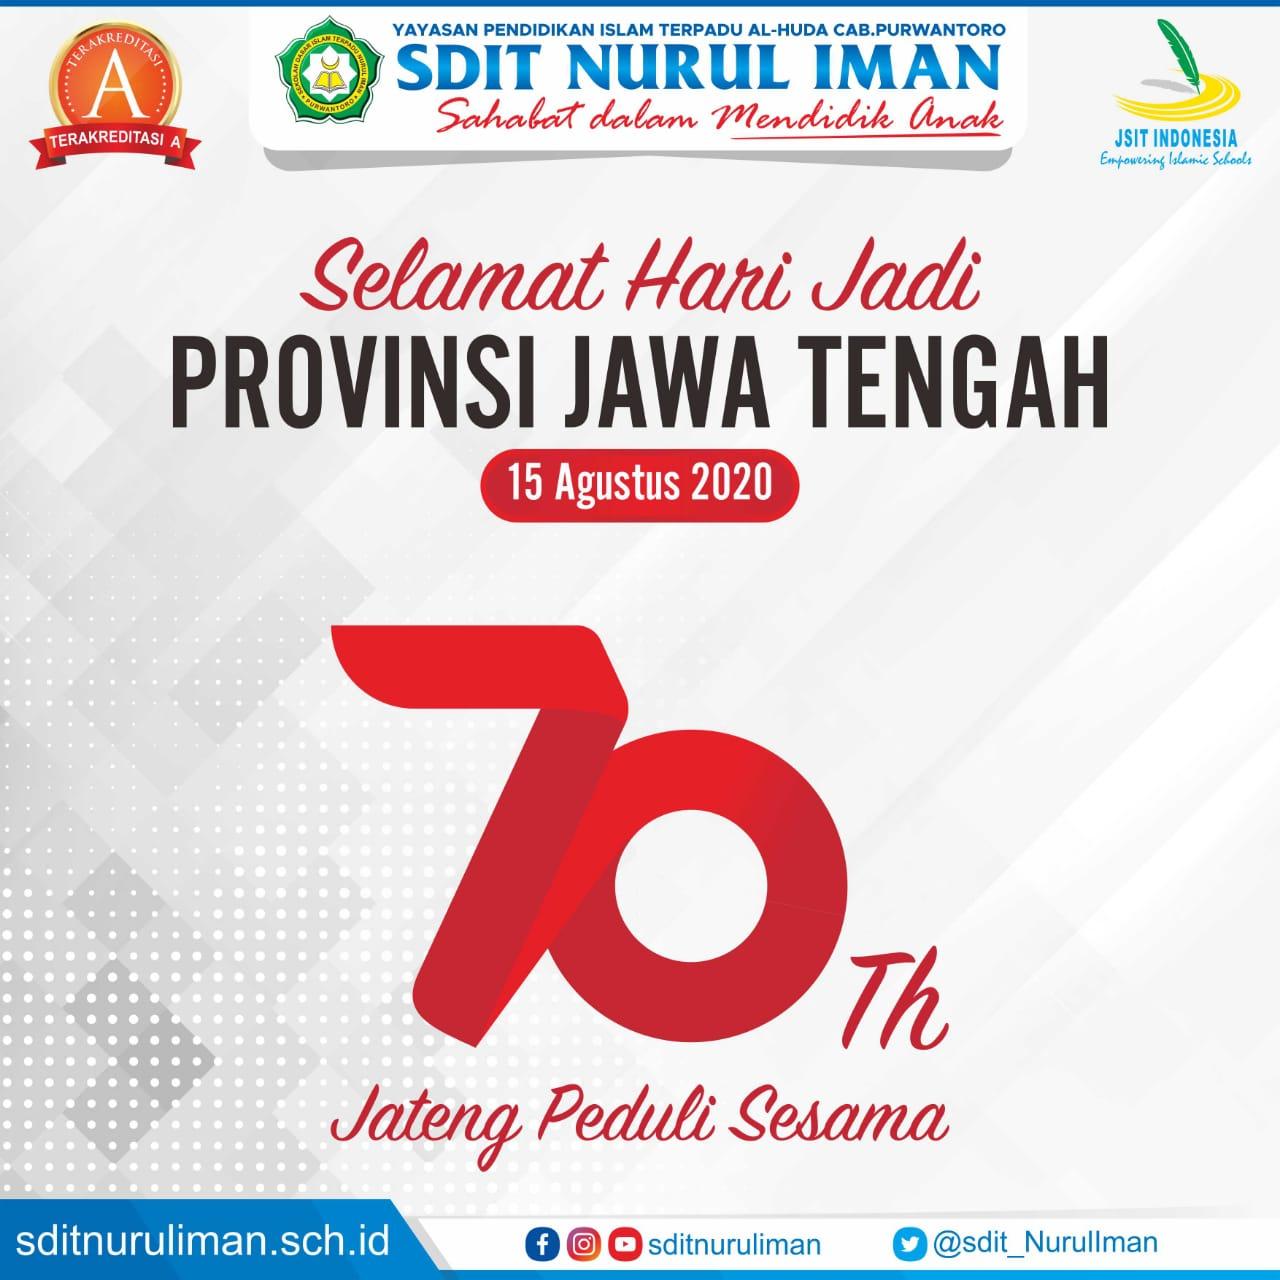 Selamat Hari Jadi Provinsi Jawa Tengah